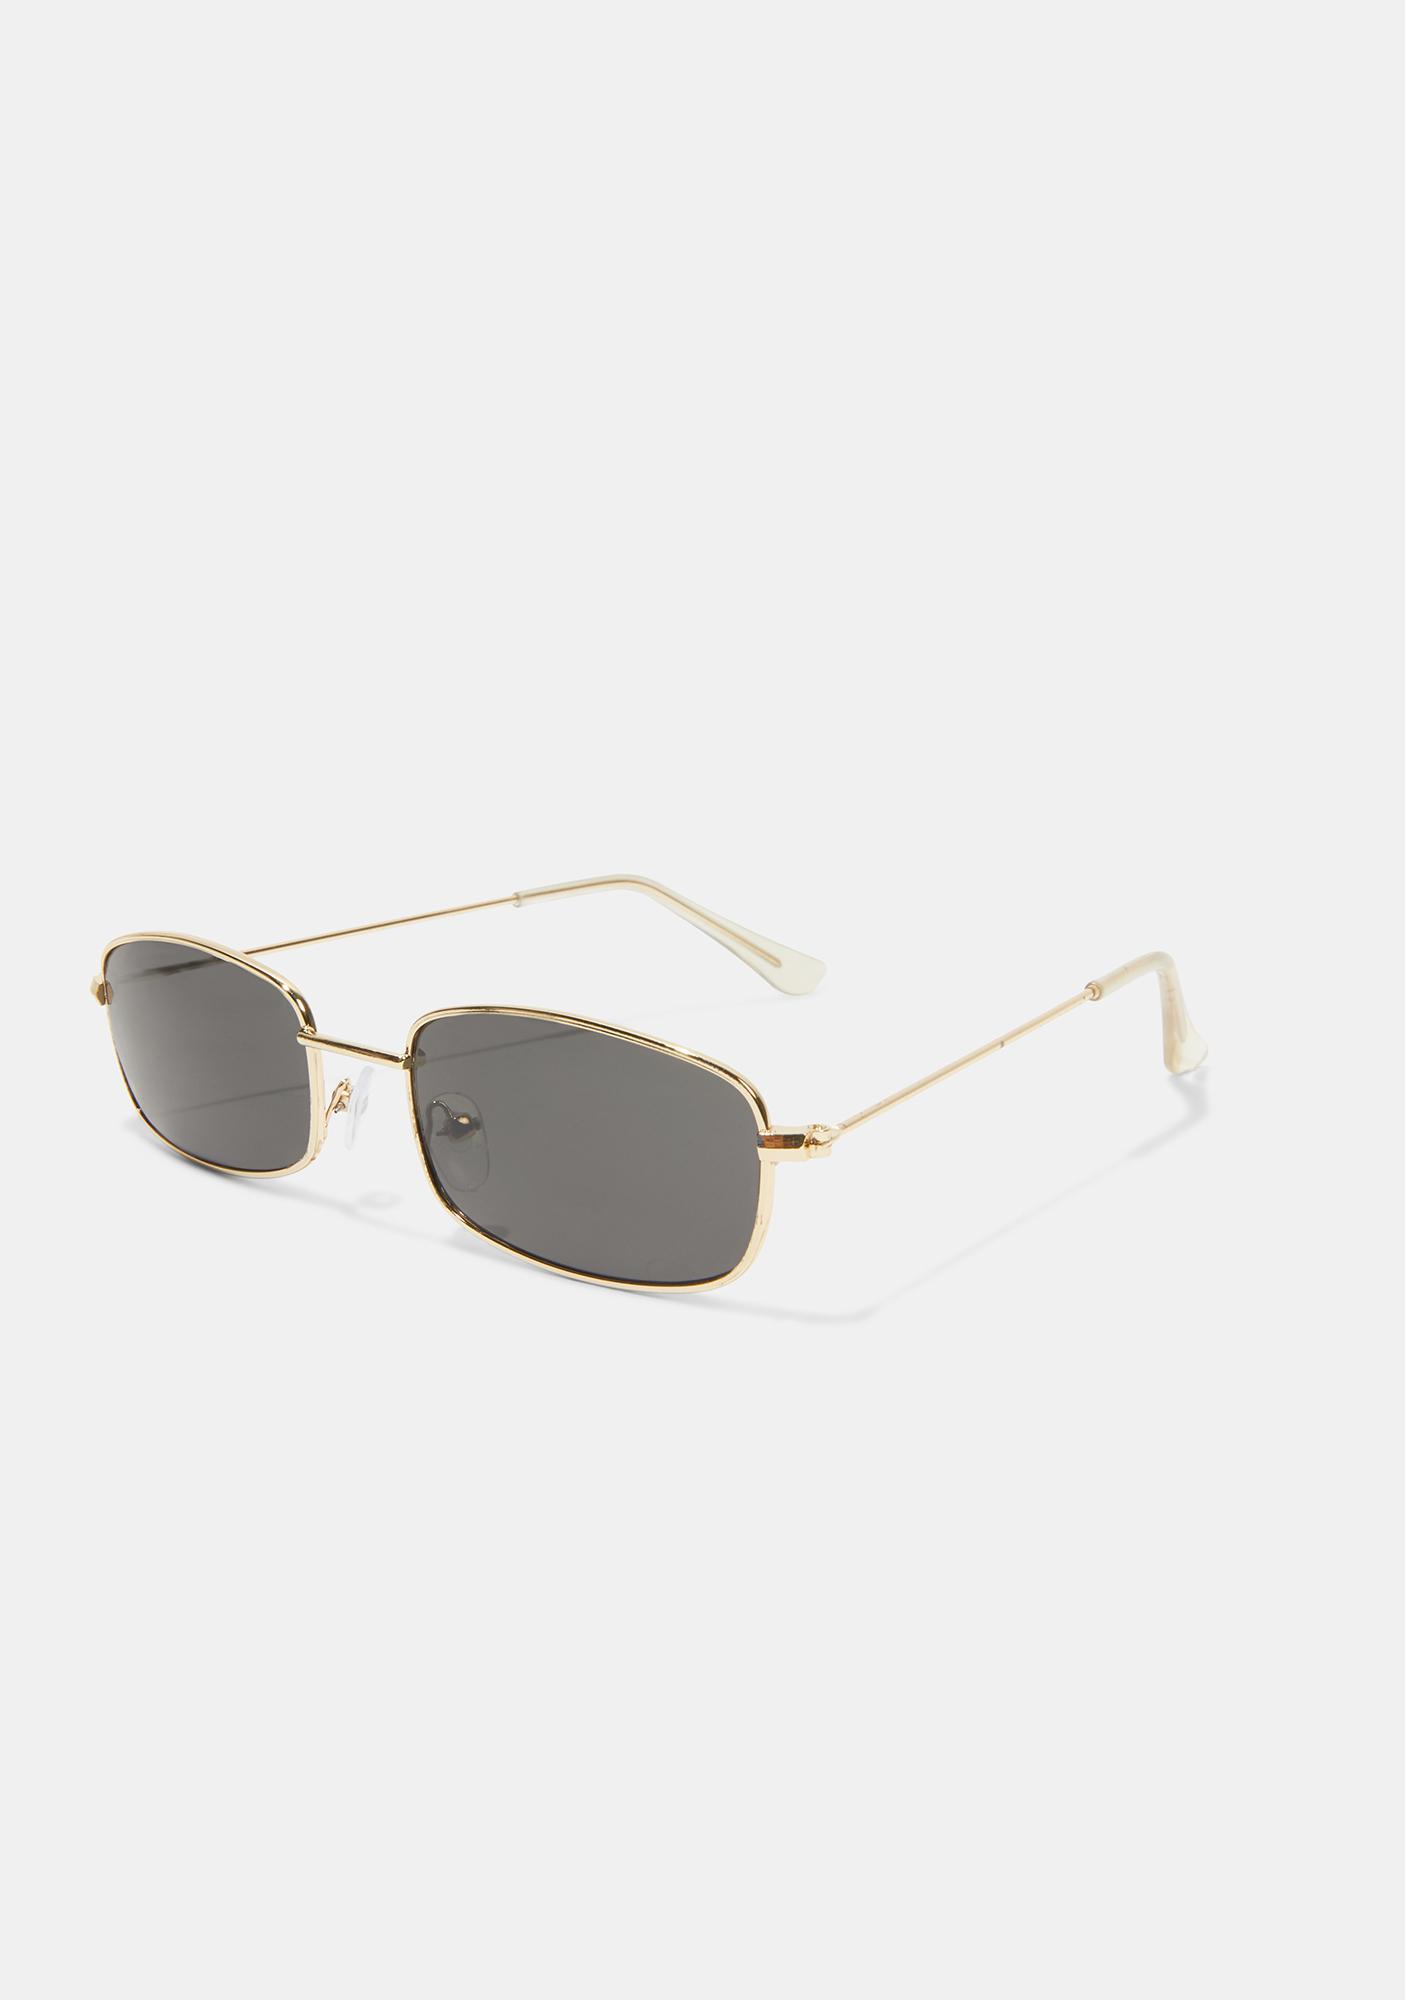 Gilded Neo Age Sunglasses